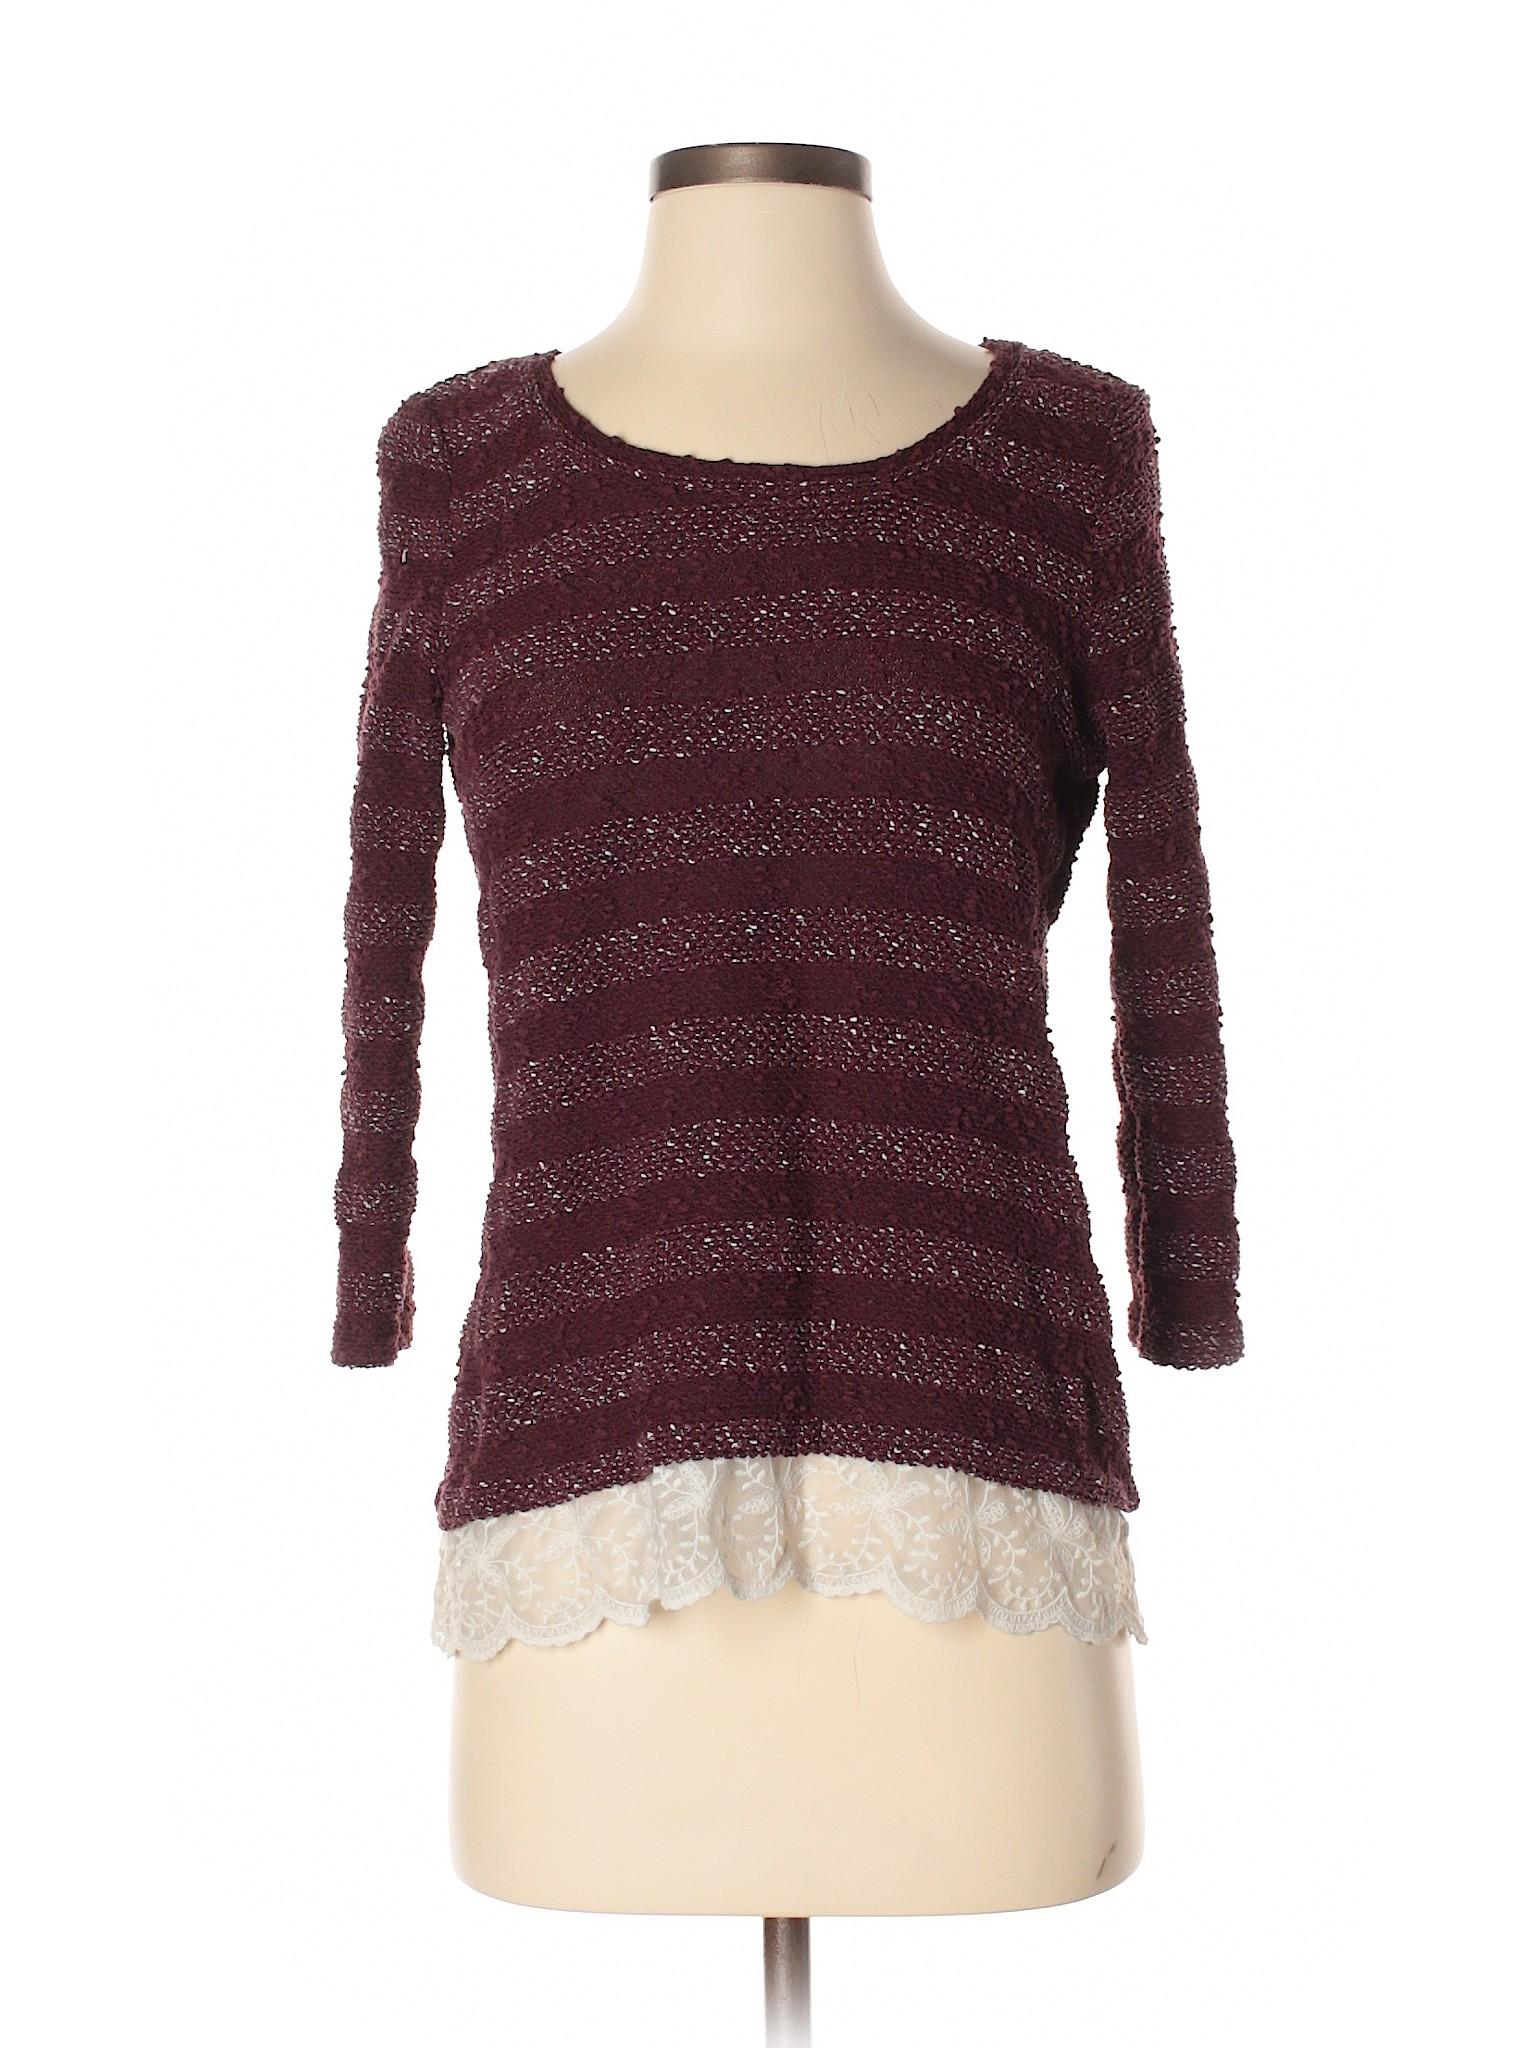 Ann Sweater Pullover Outlet LOFT Boutique Taylor qvHaqw